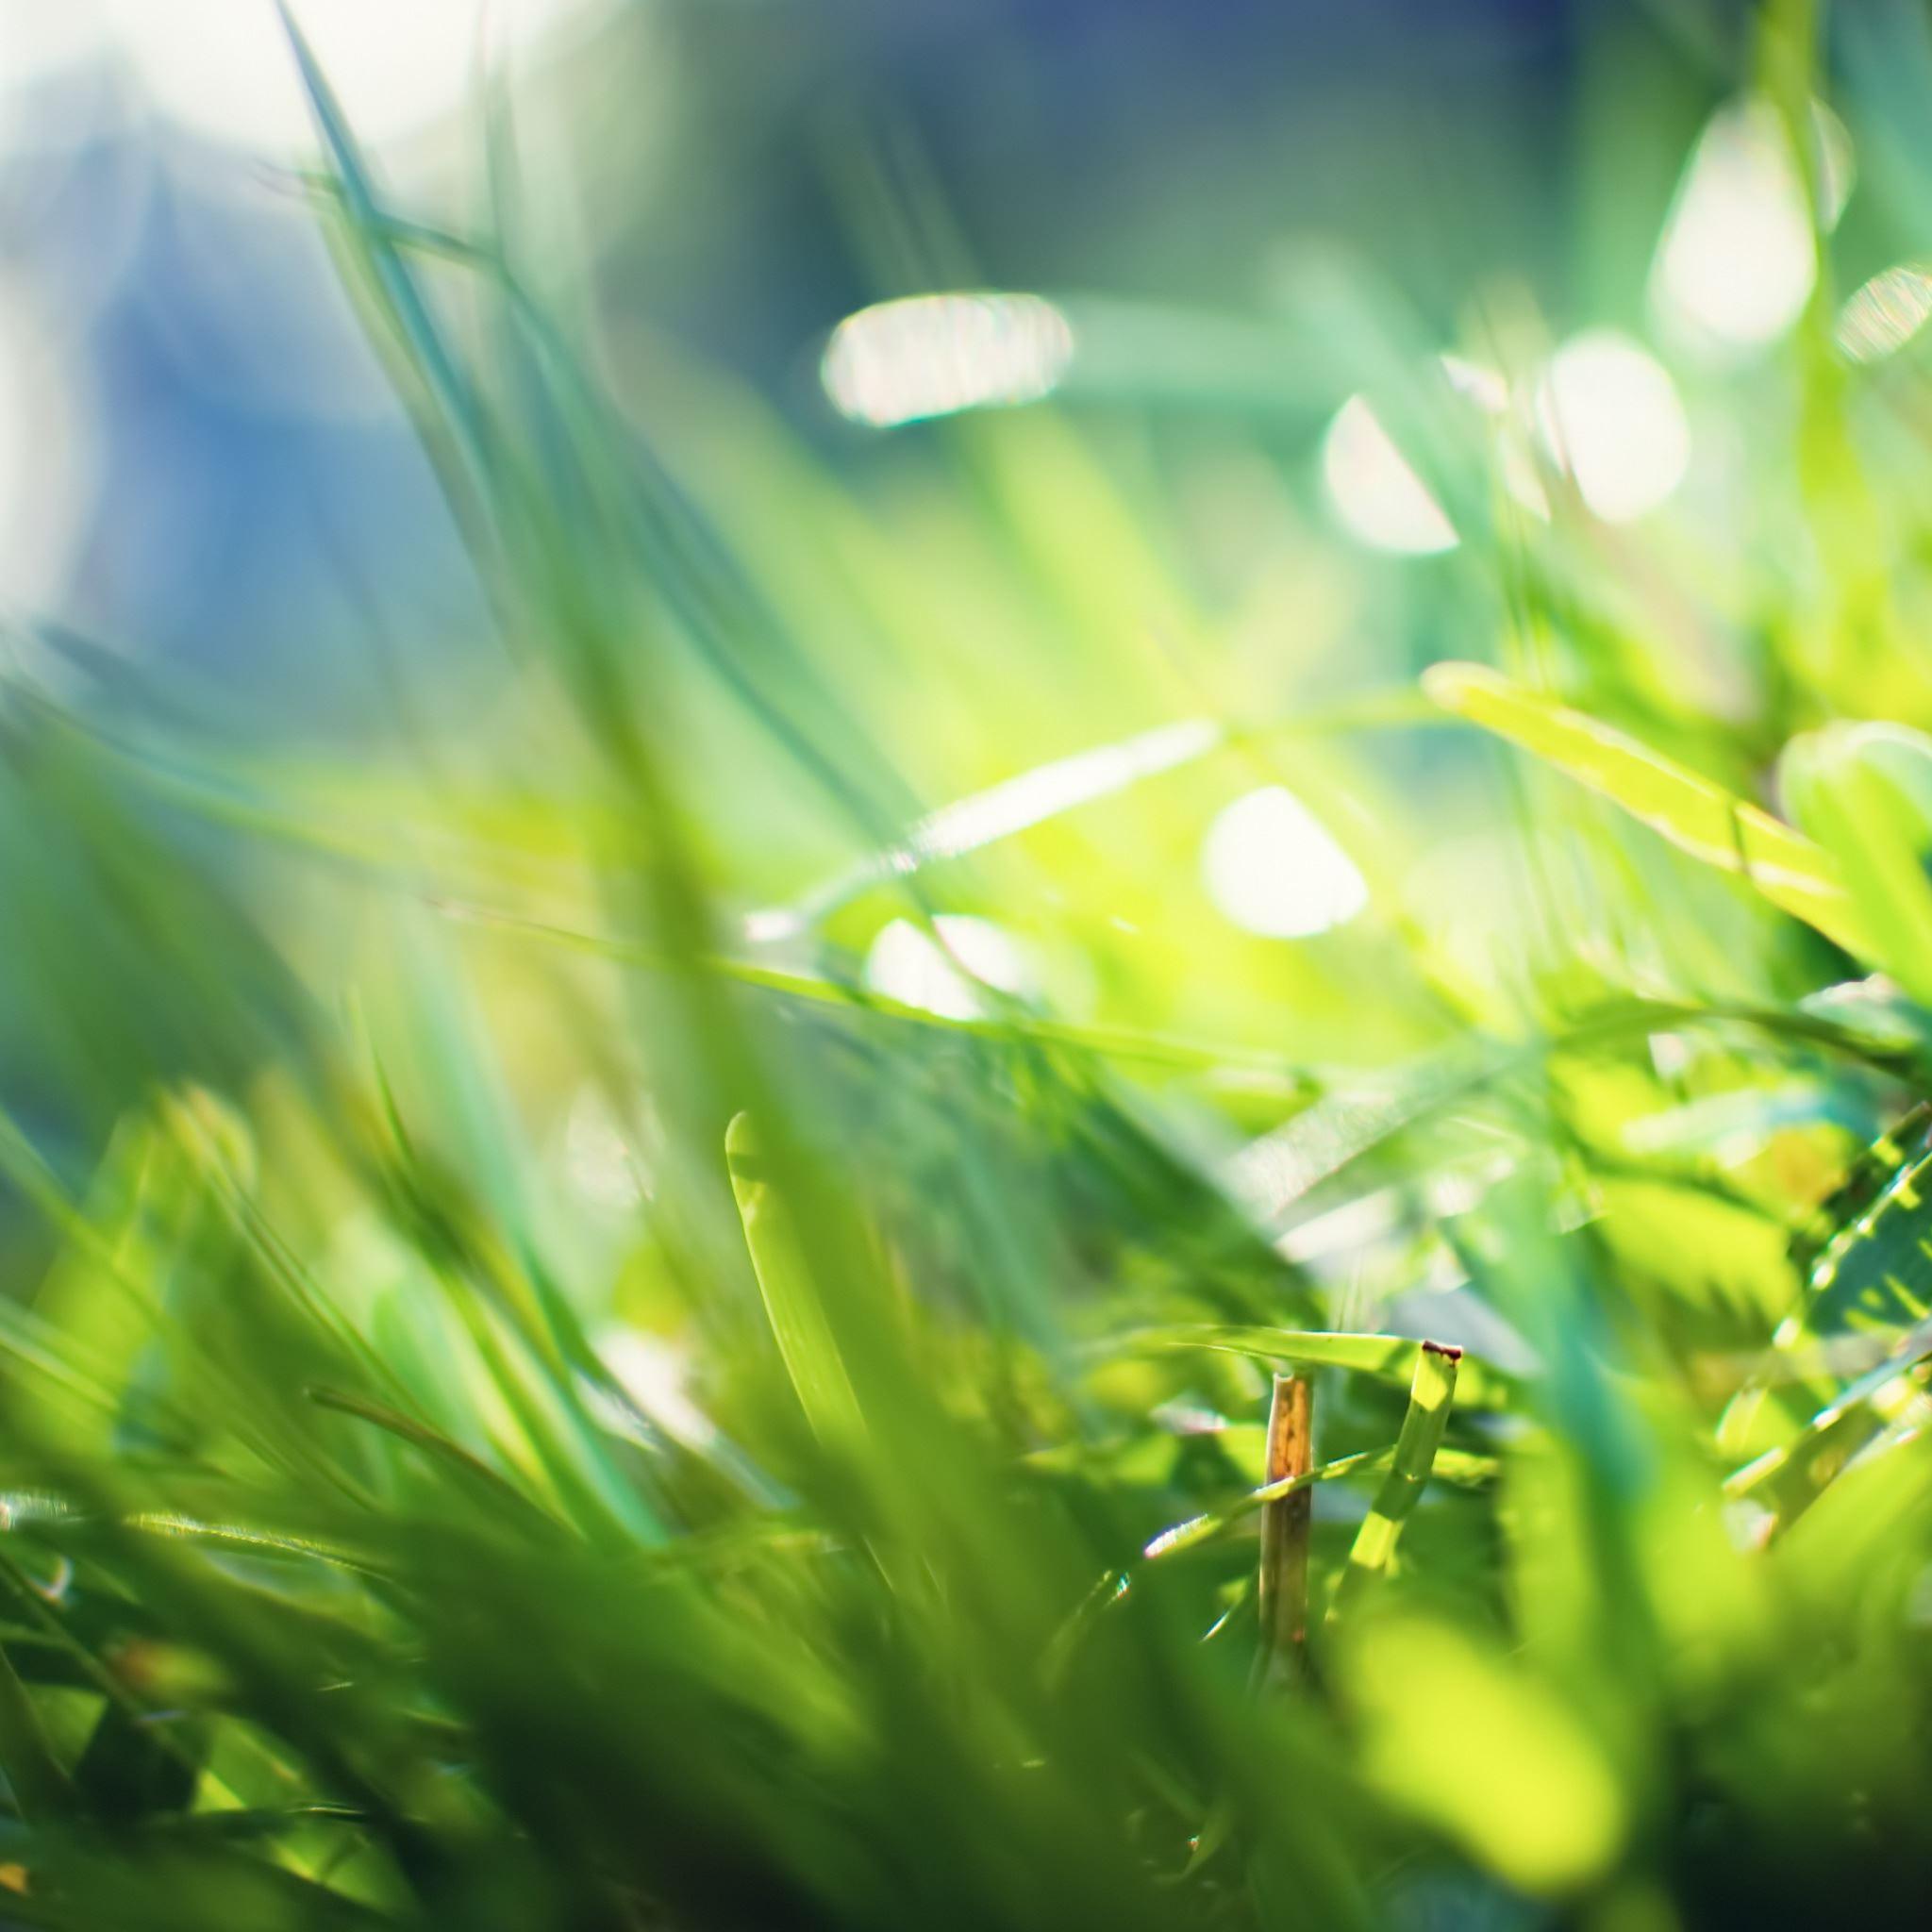 Grass Bokeh 2 iPad Air wallpaper